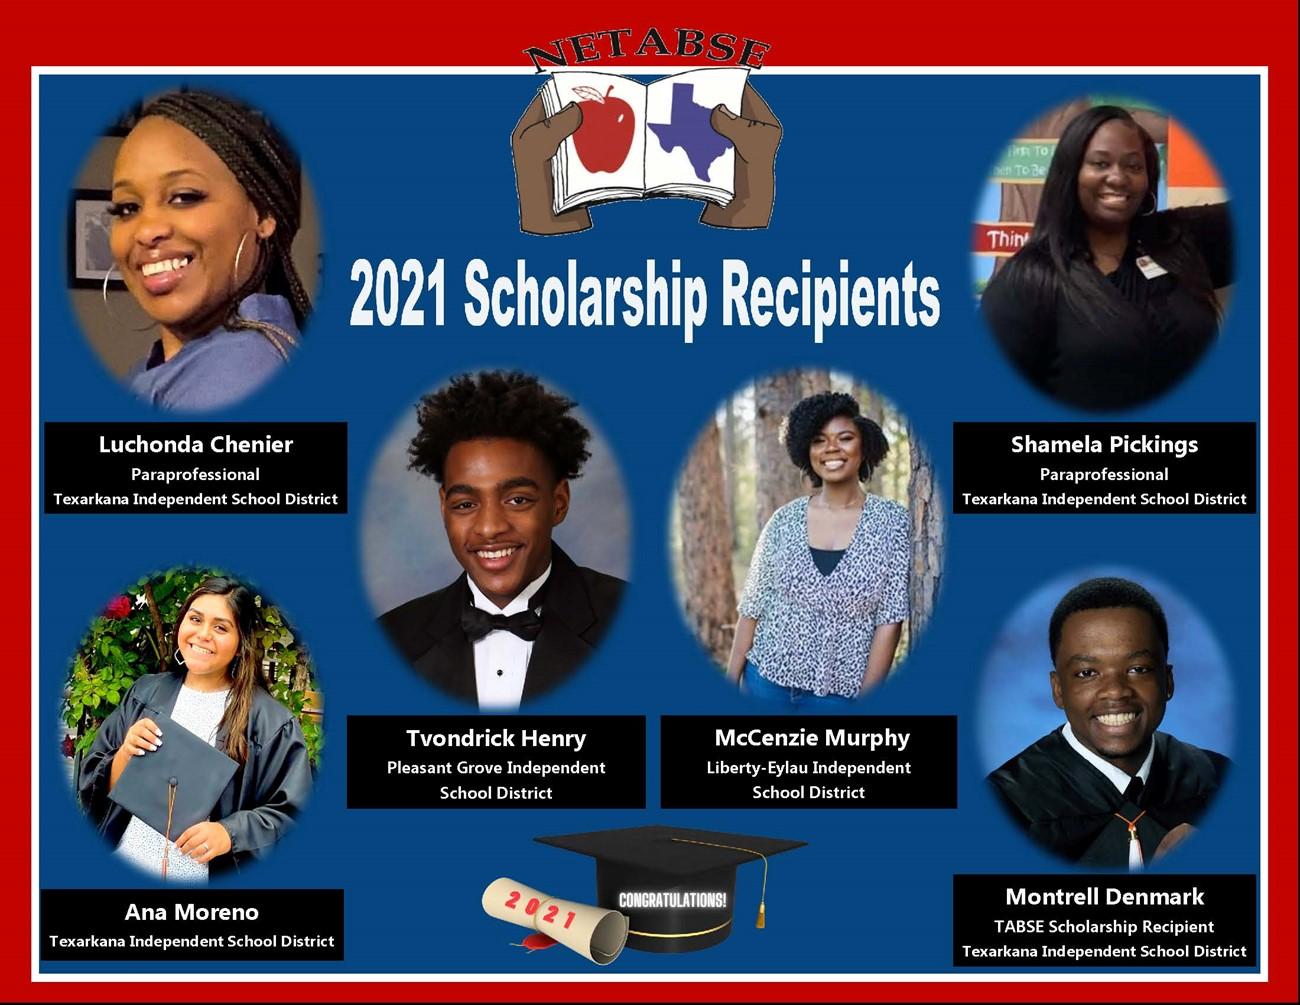 NETABSE 2021 Scholarship Recipients